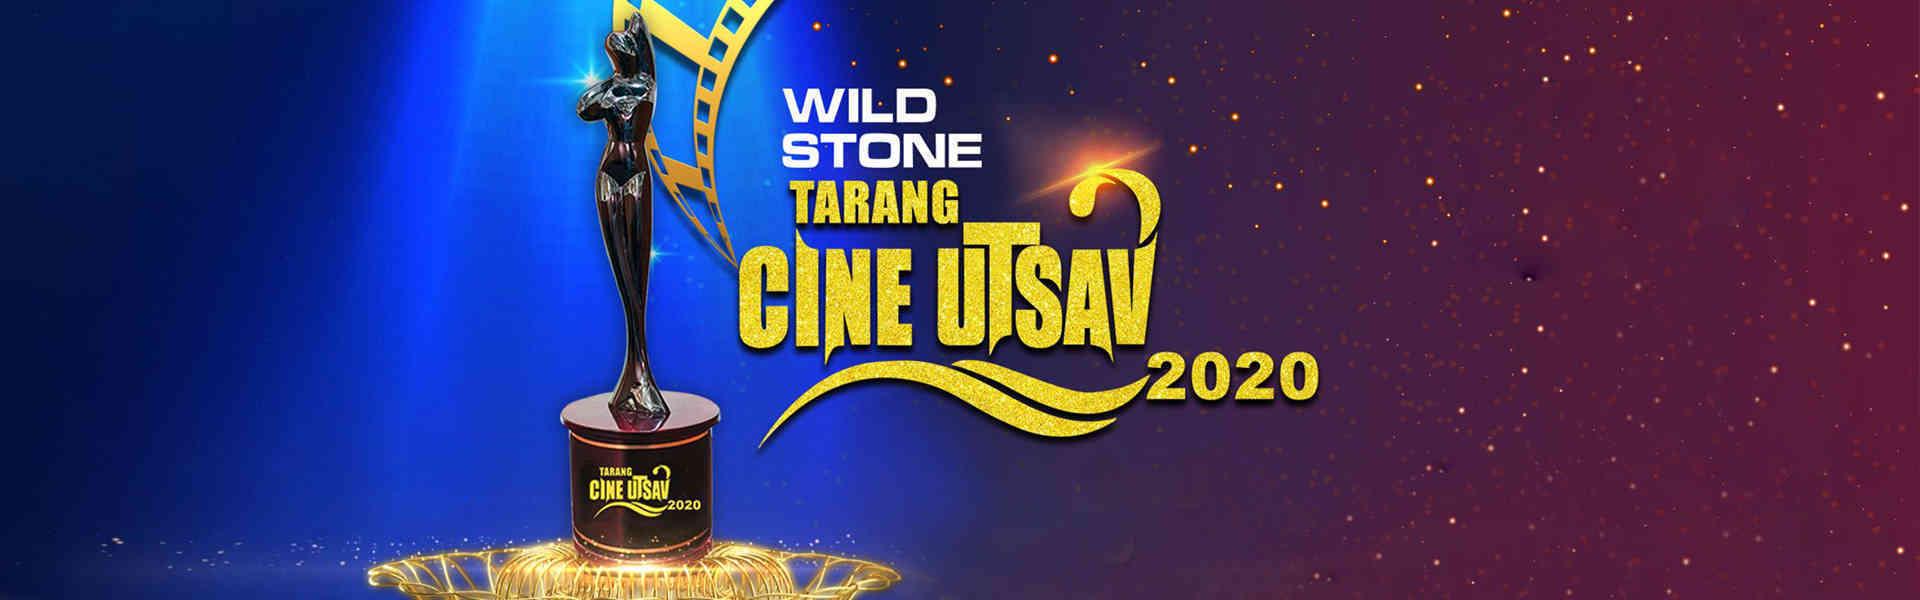 Tarang Cine Utsav 2020